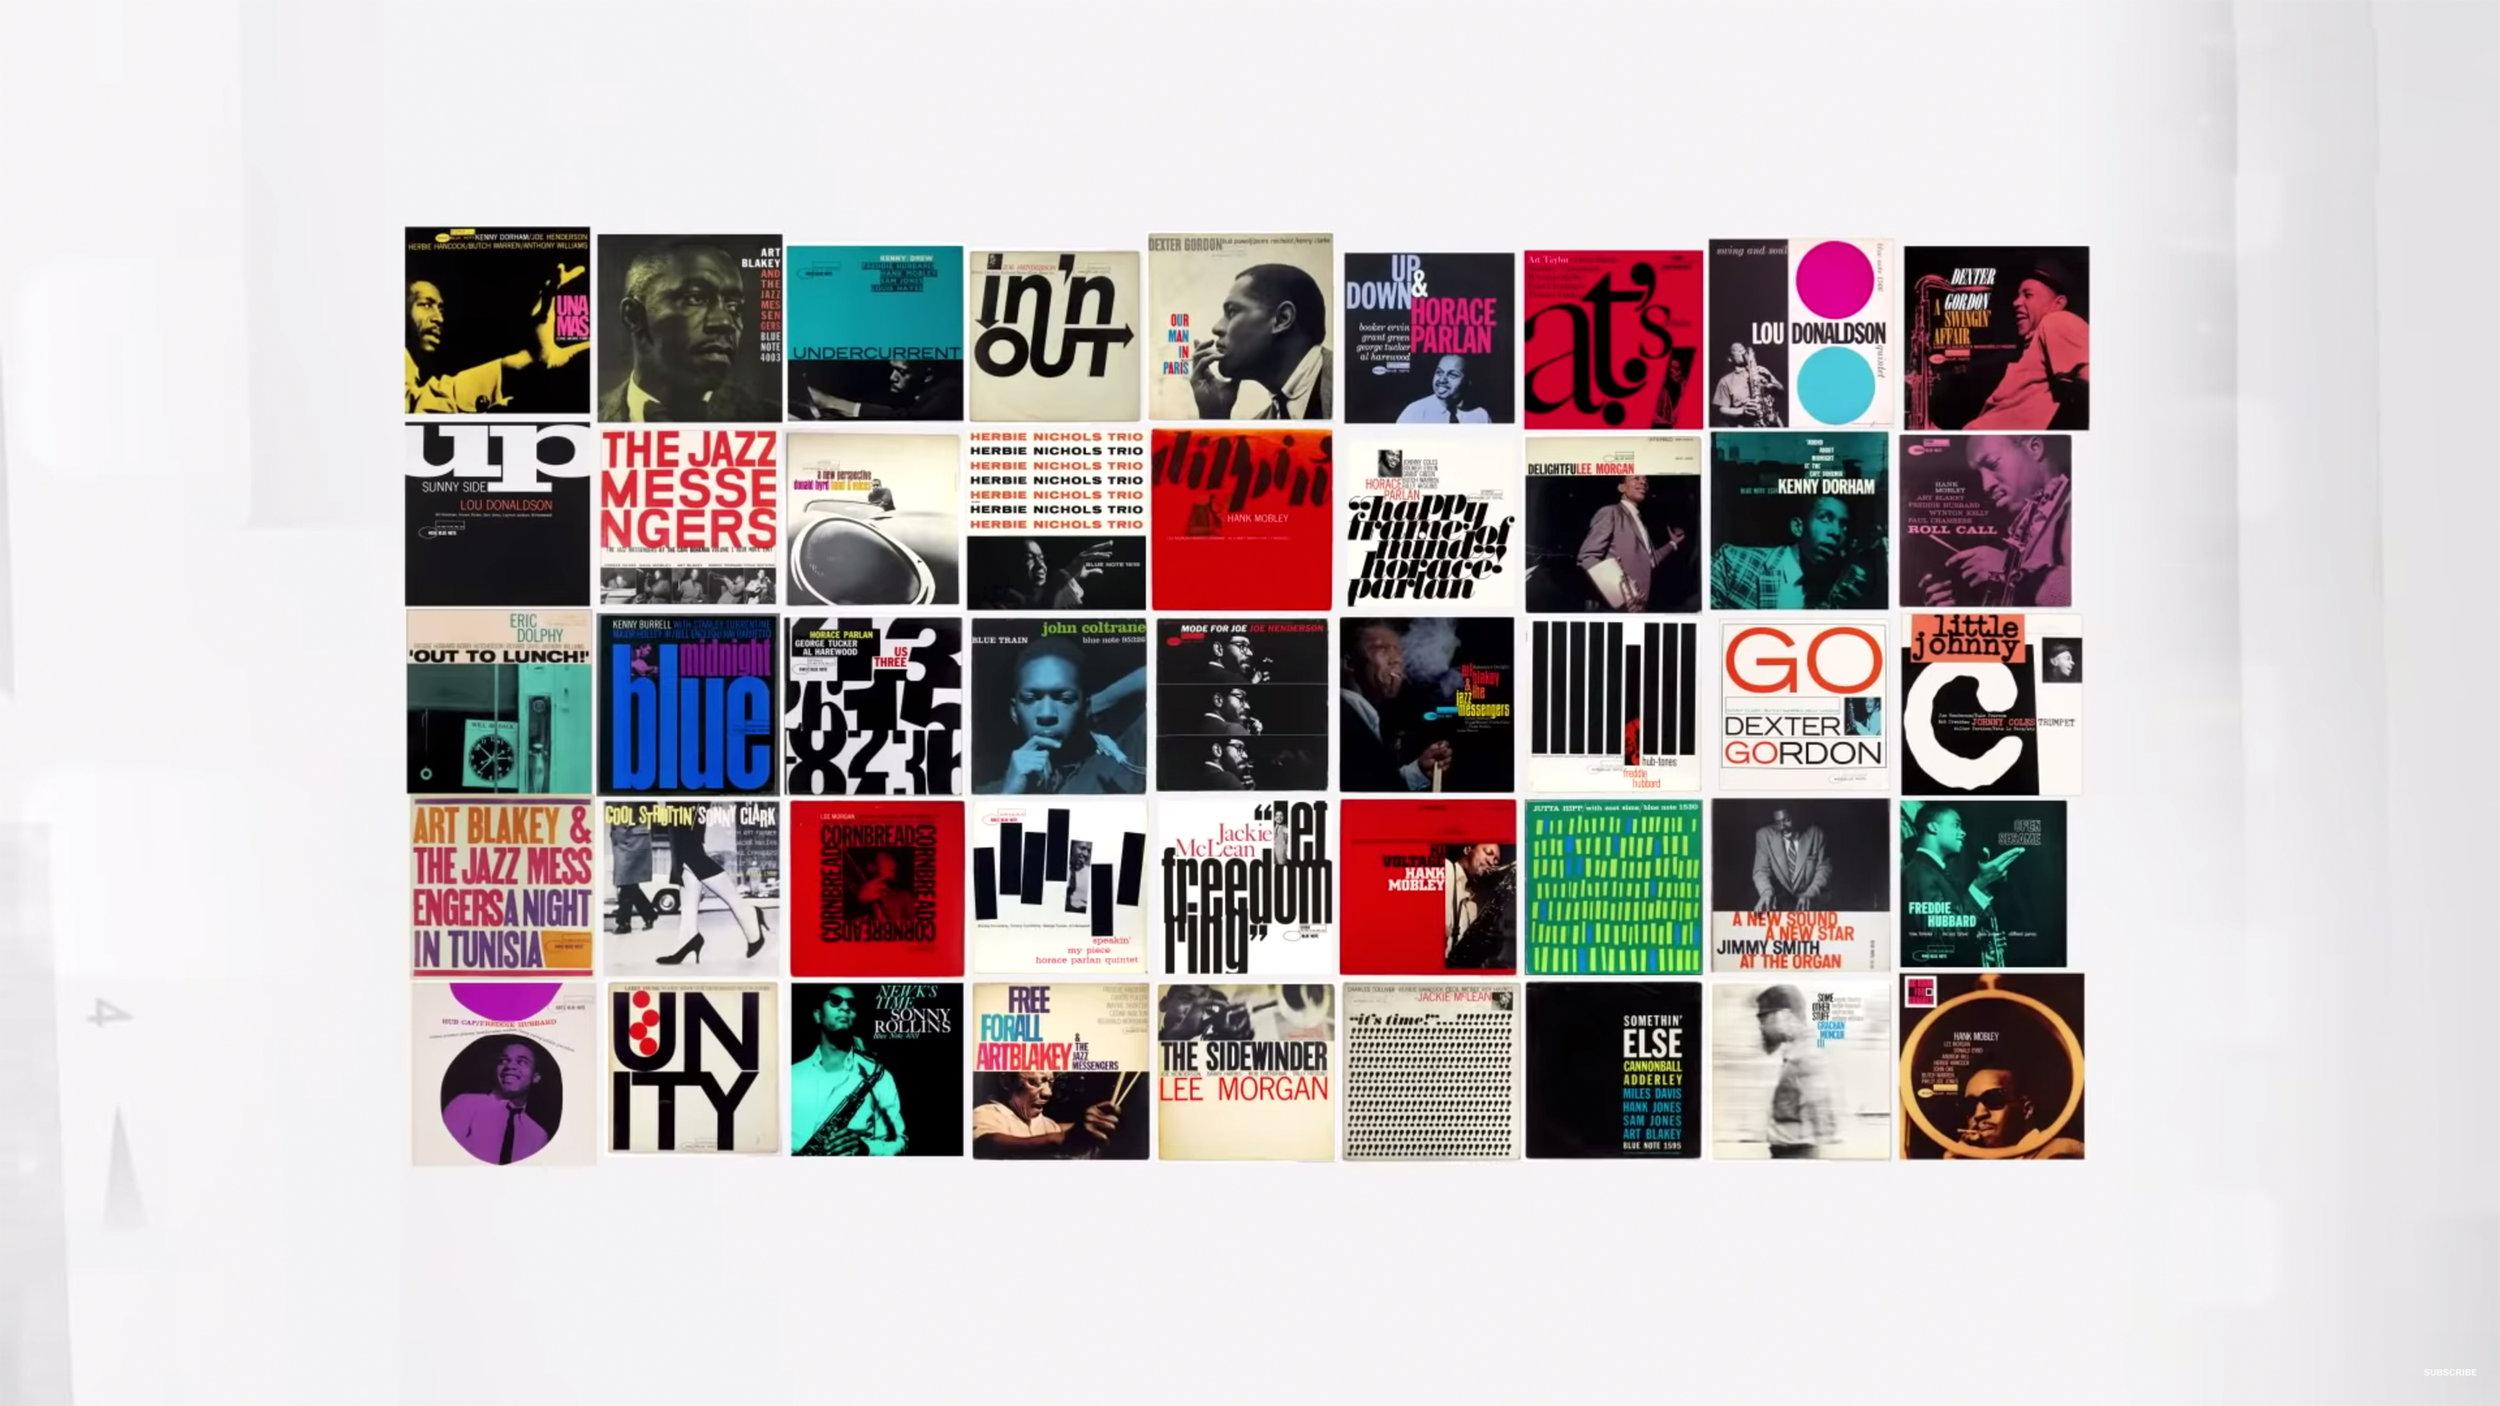 07.  The Greatest Album Covers of Jazz